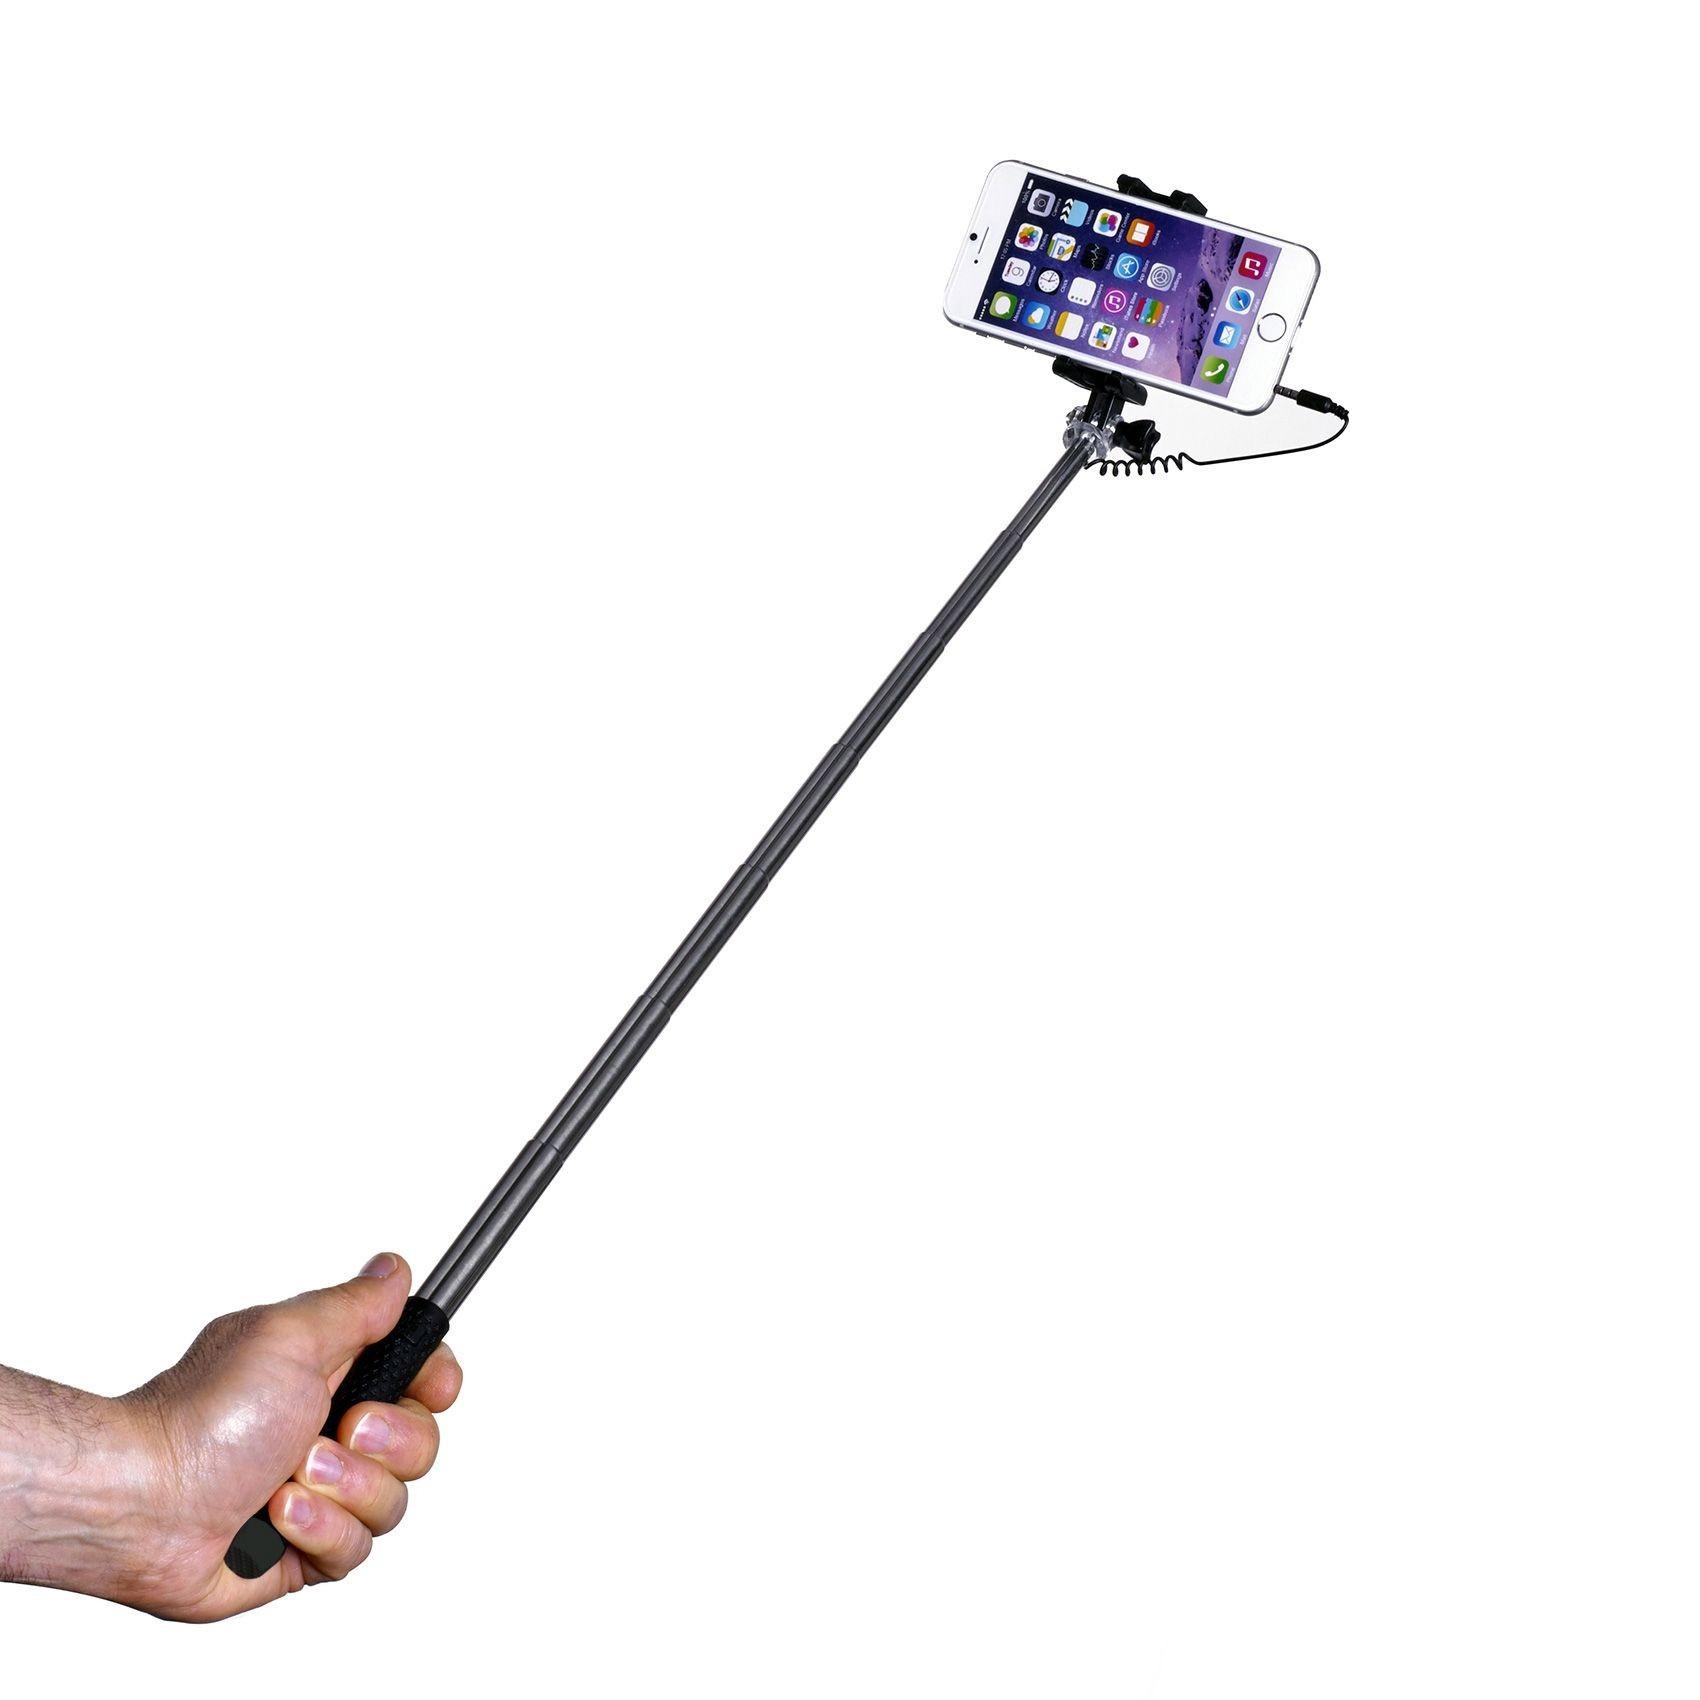 telemark hulgi celly selfie stick mini 3 5mm juhtmega. Black Bedroom Furniture Sets. Home Design Ideas